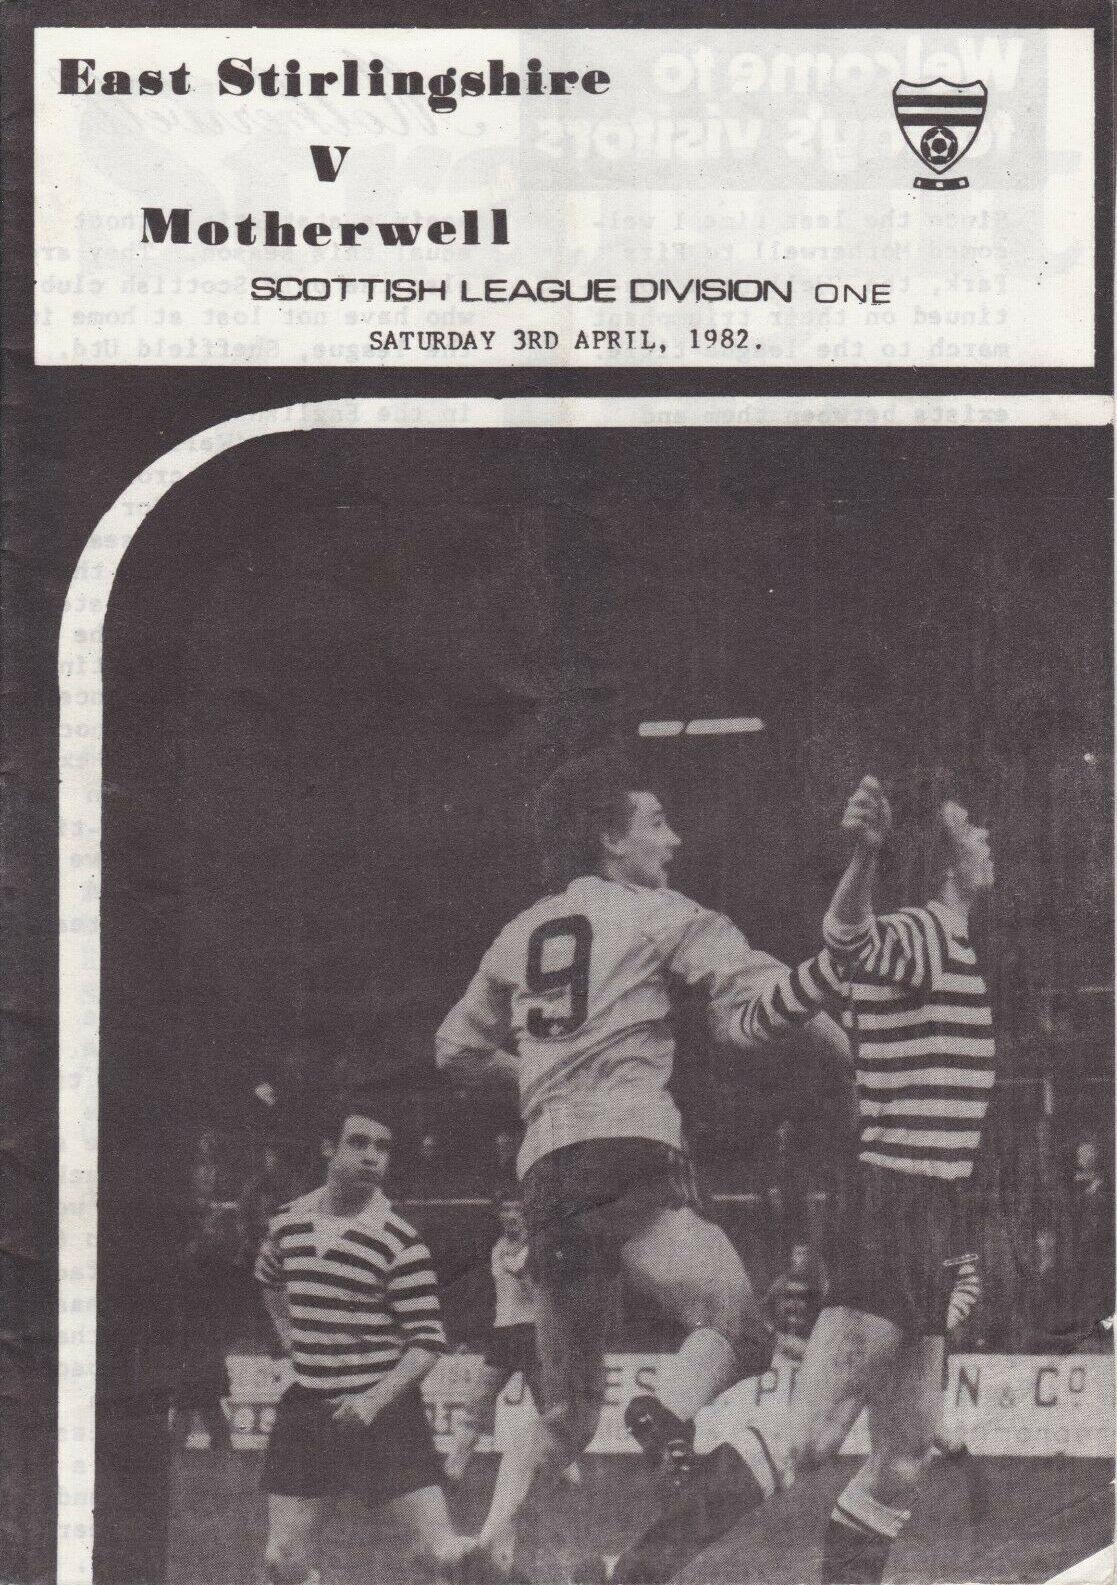 versus East Stirlingshire Programme Cover